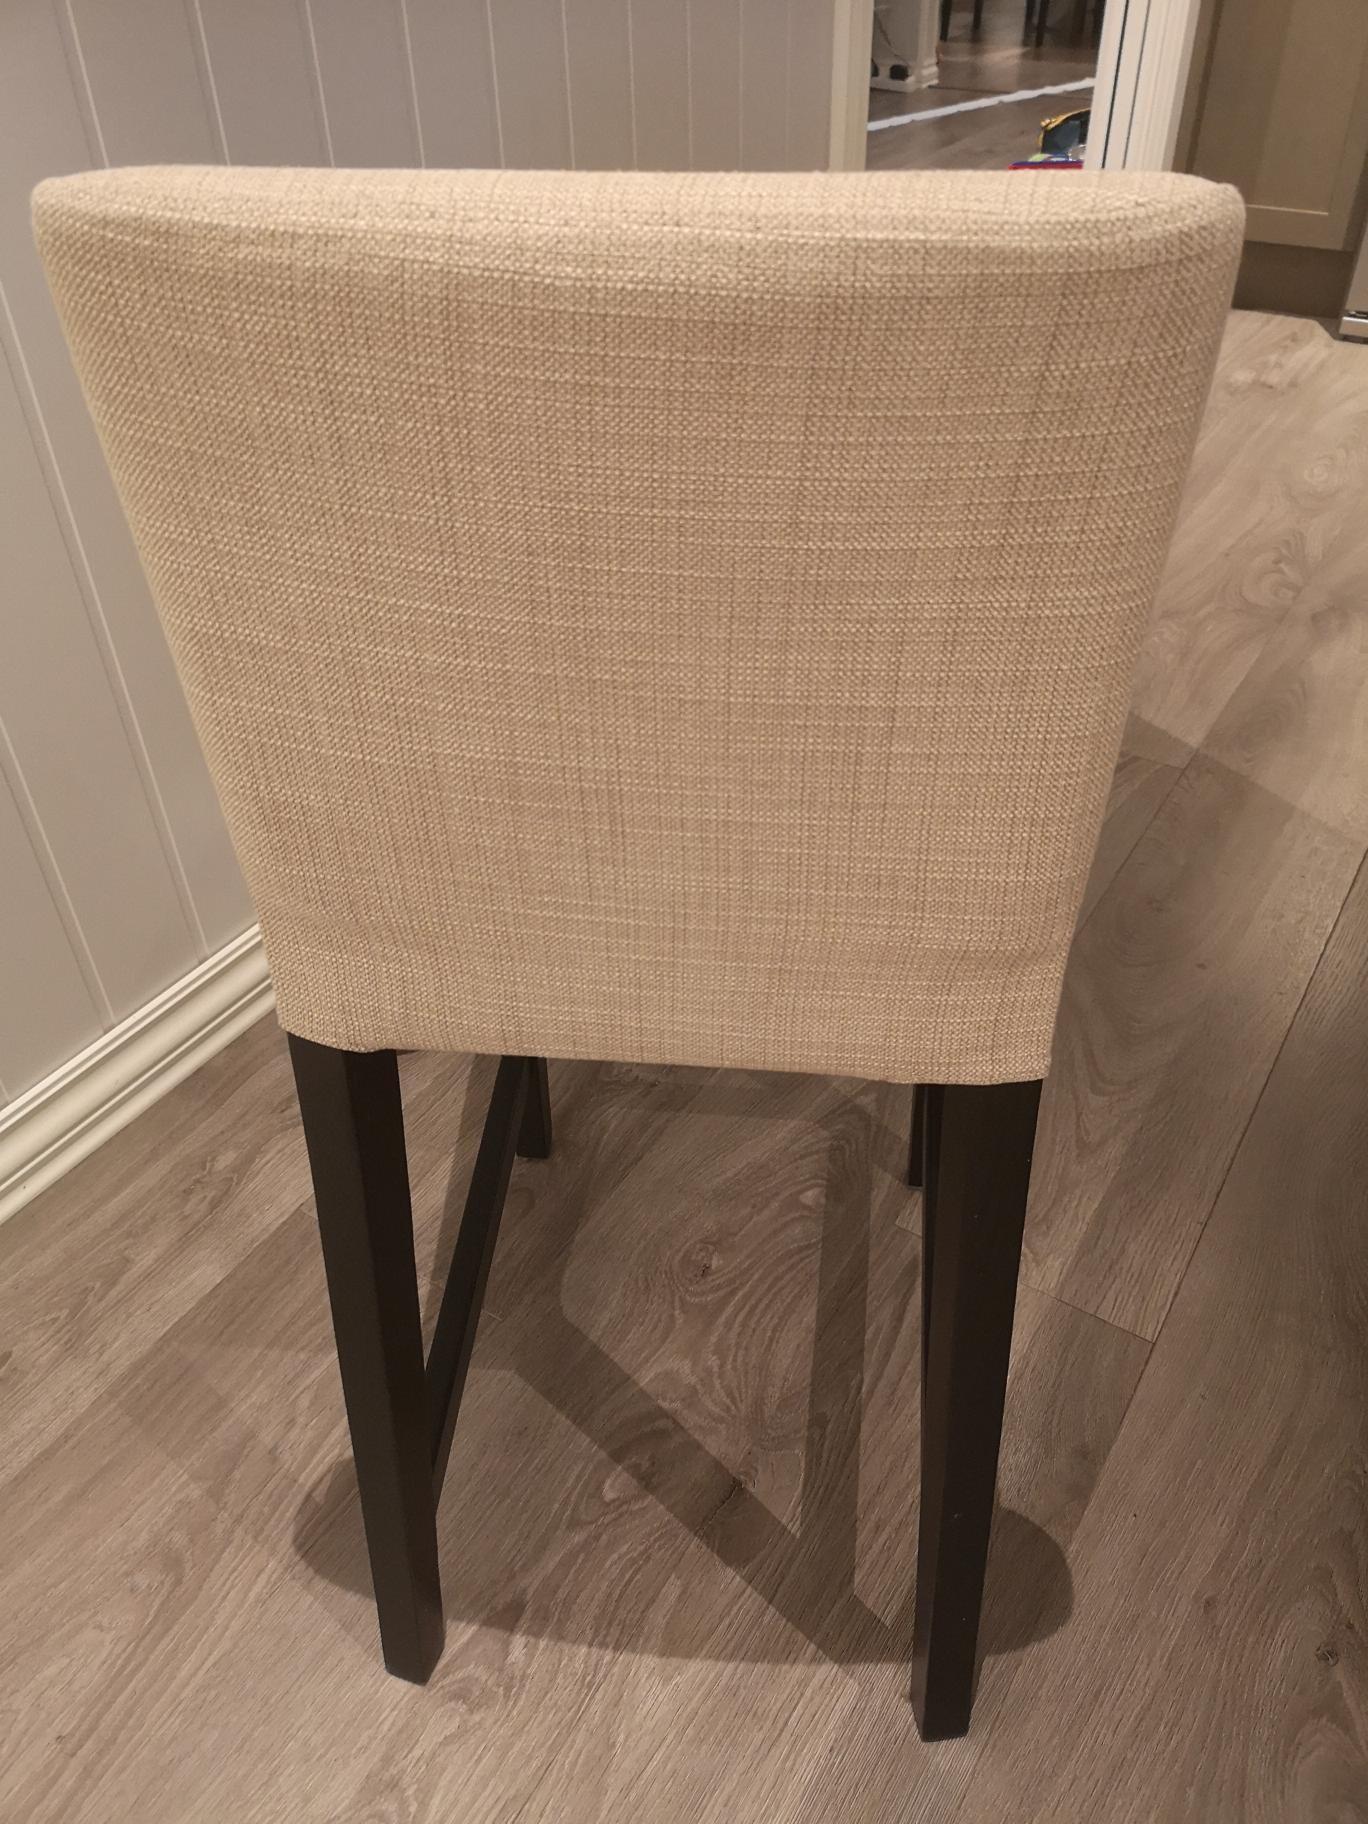 1 Henriksendal bar stoler mtrekk | FINN.no